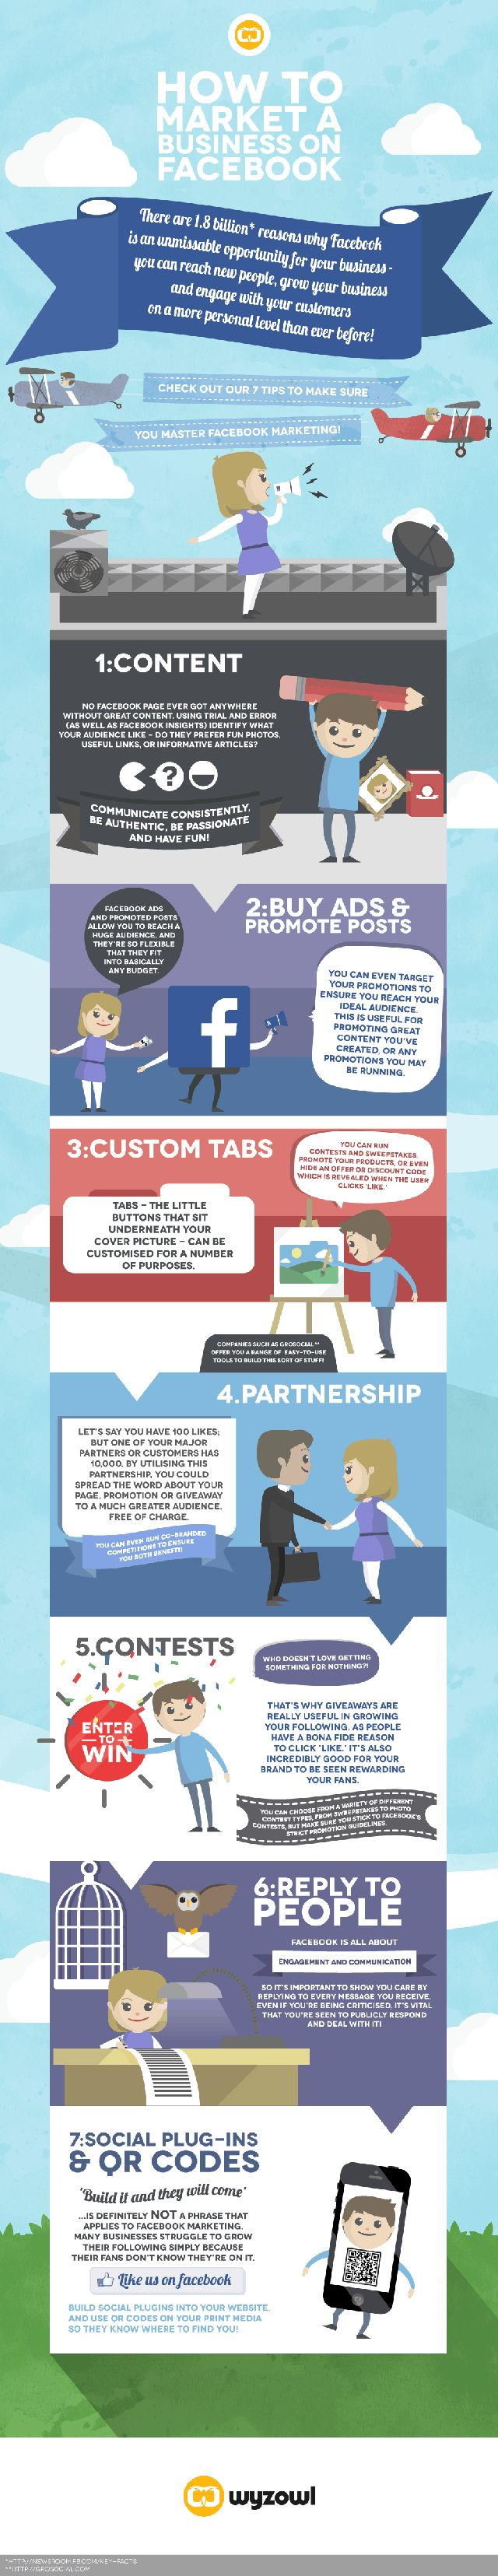 How to market a business on FaceBook #infografia #infographic #marketing #socialmedia